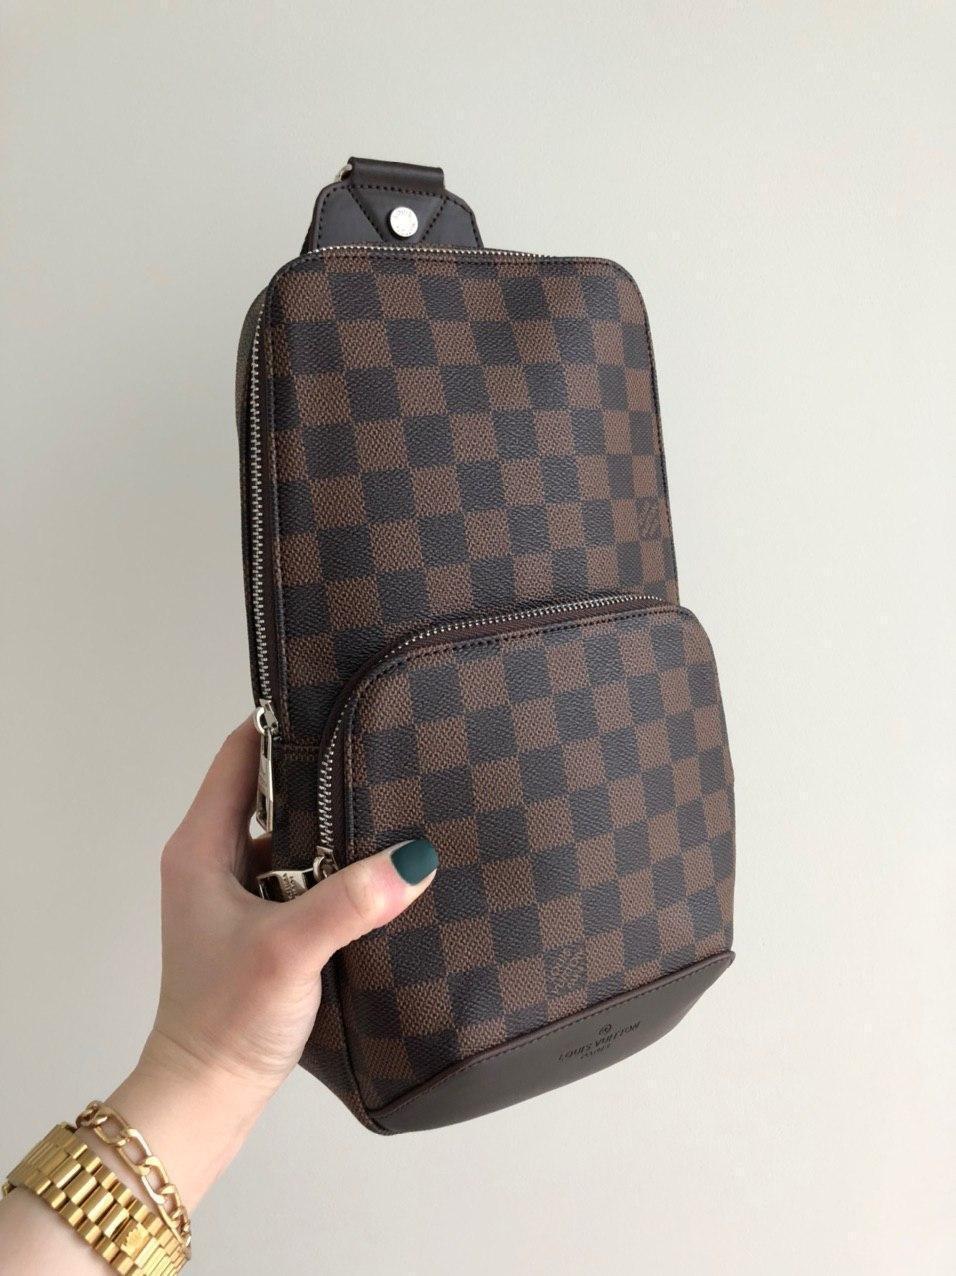 Сумка слинг через плечо Louis Vuitton M128 коричневая